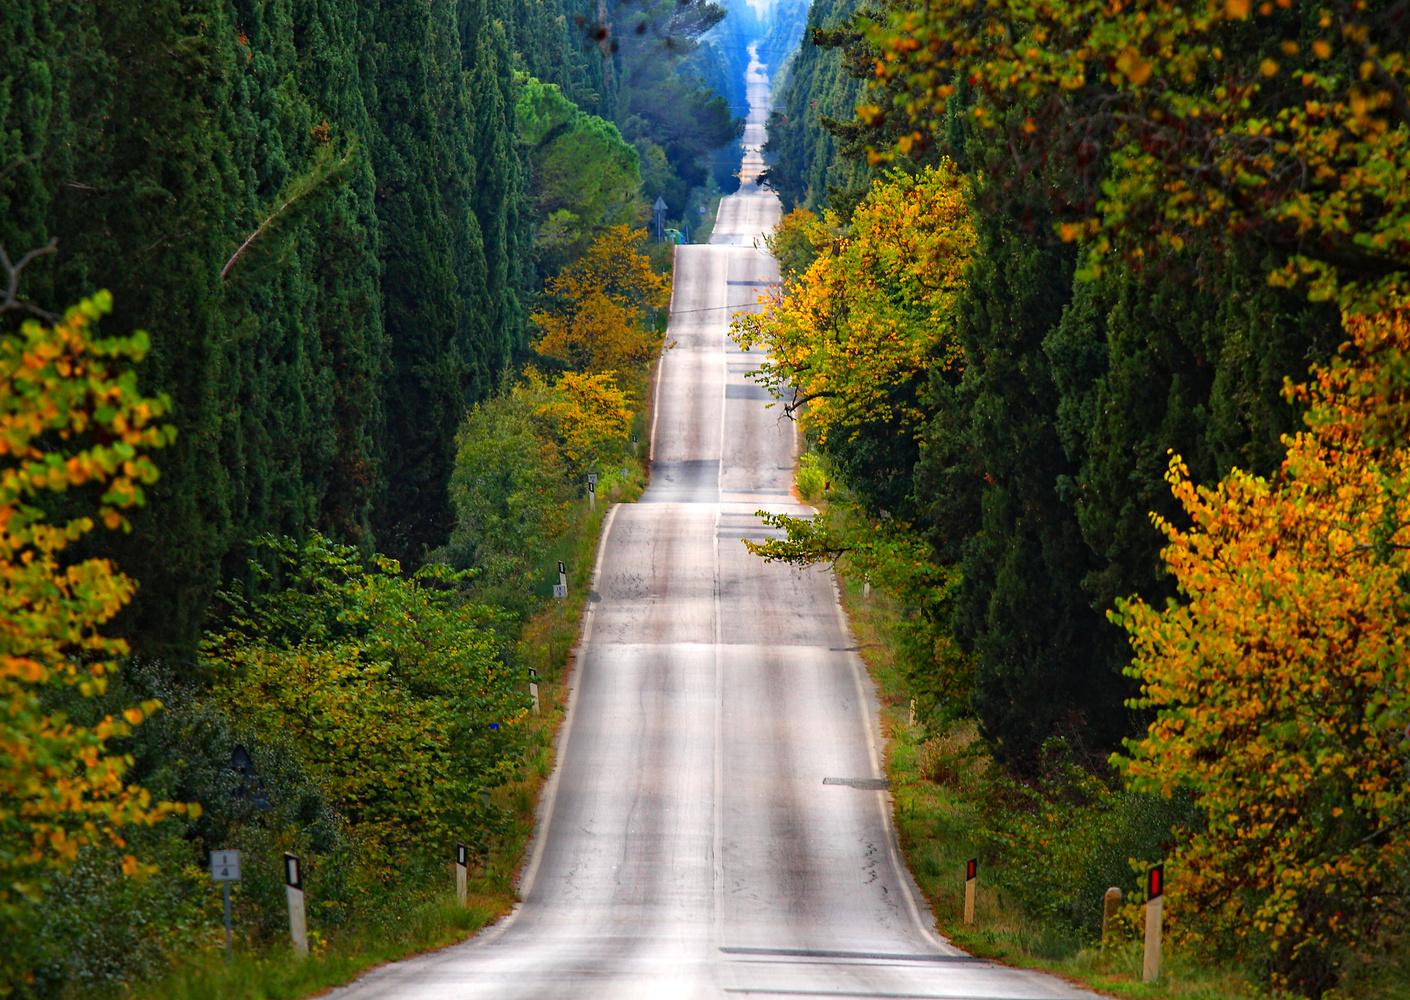 Cypress road by Stefano Venturi